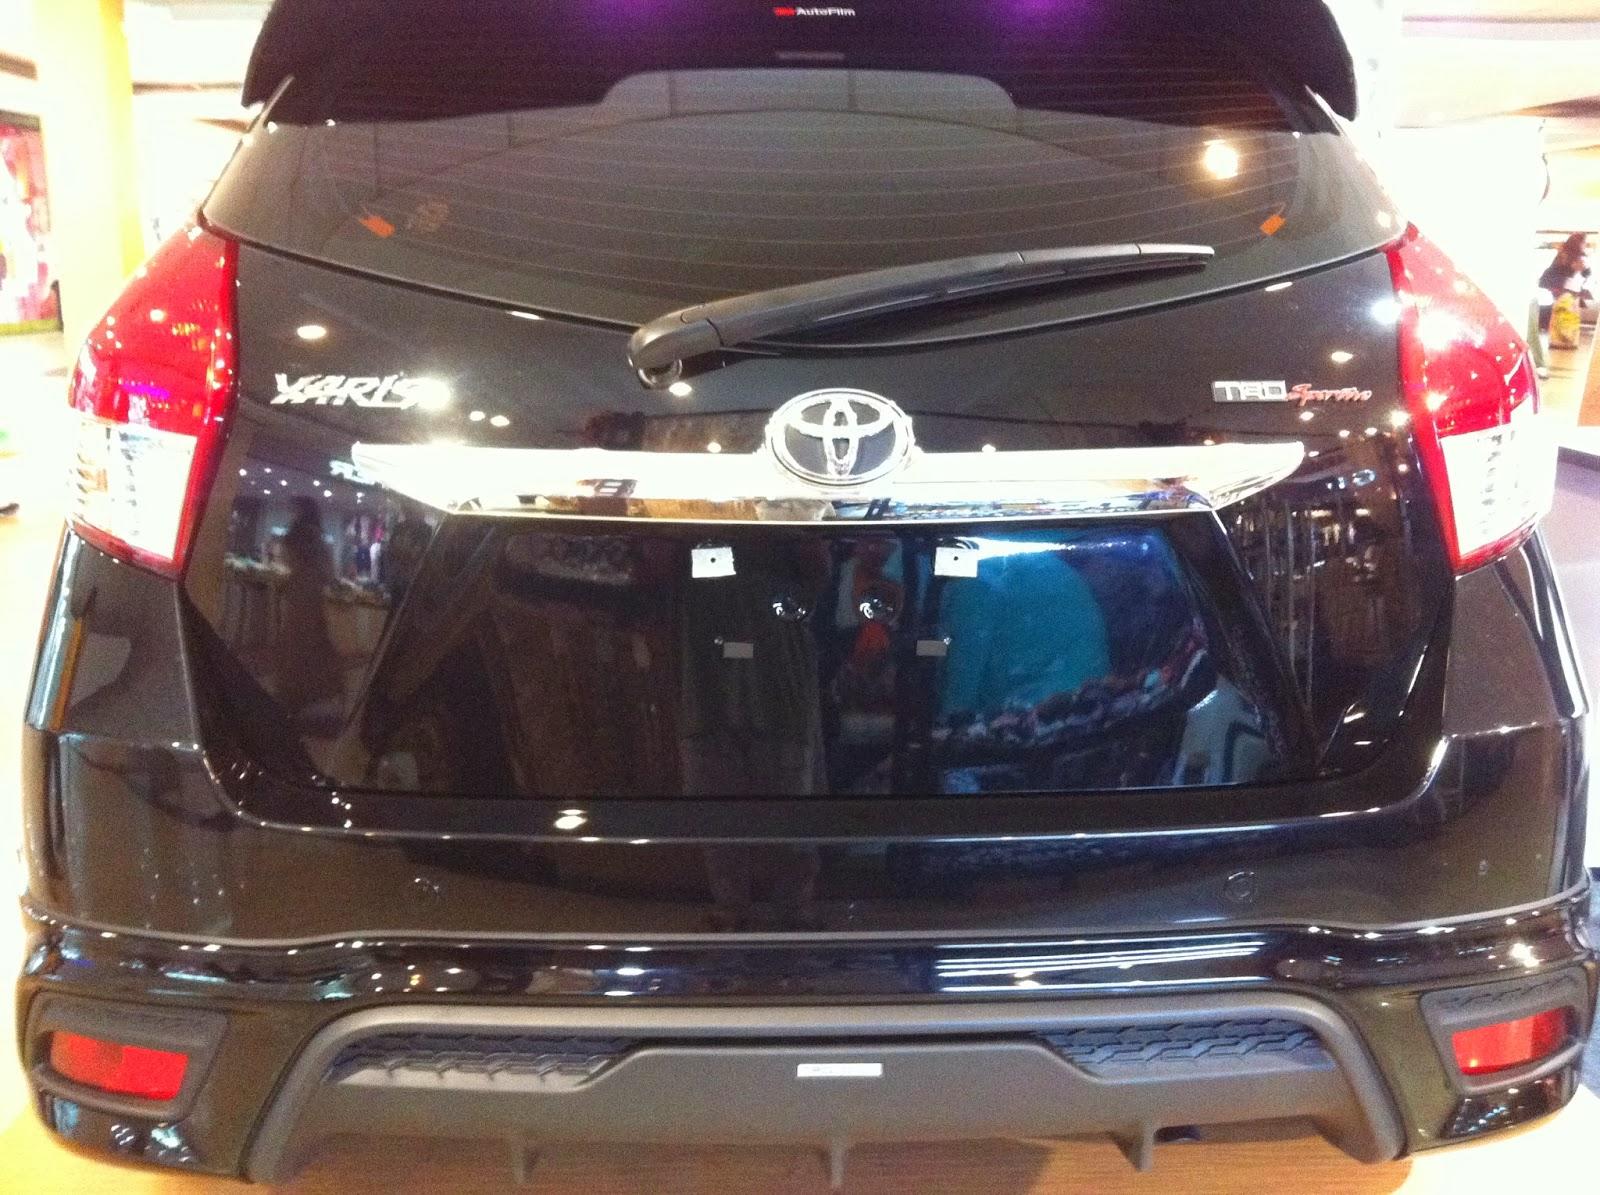 Harga Toyota New Yaris Trd 2014 Grand Veloz Bekas First Impression All Andra